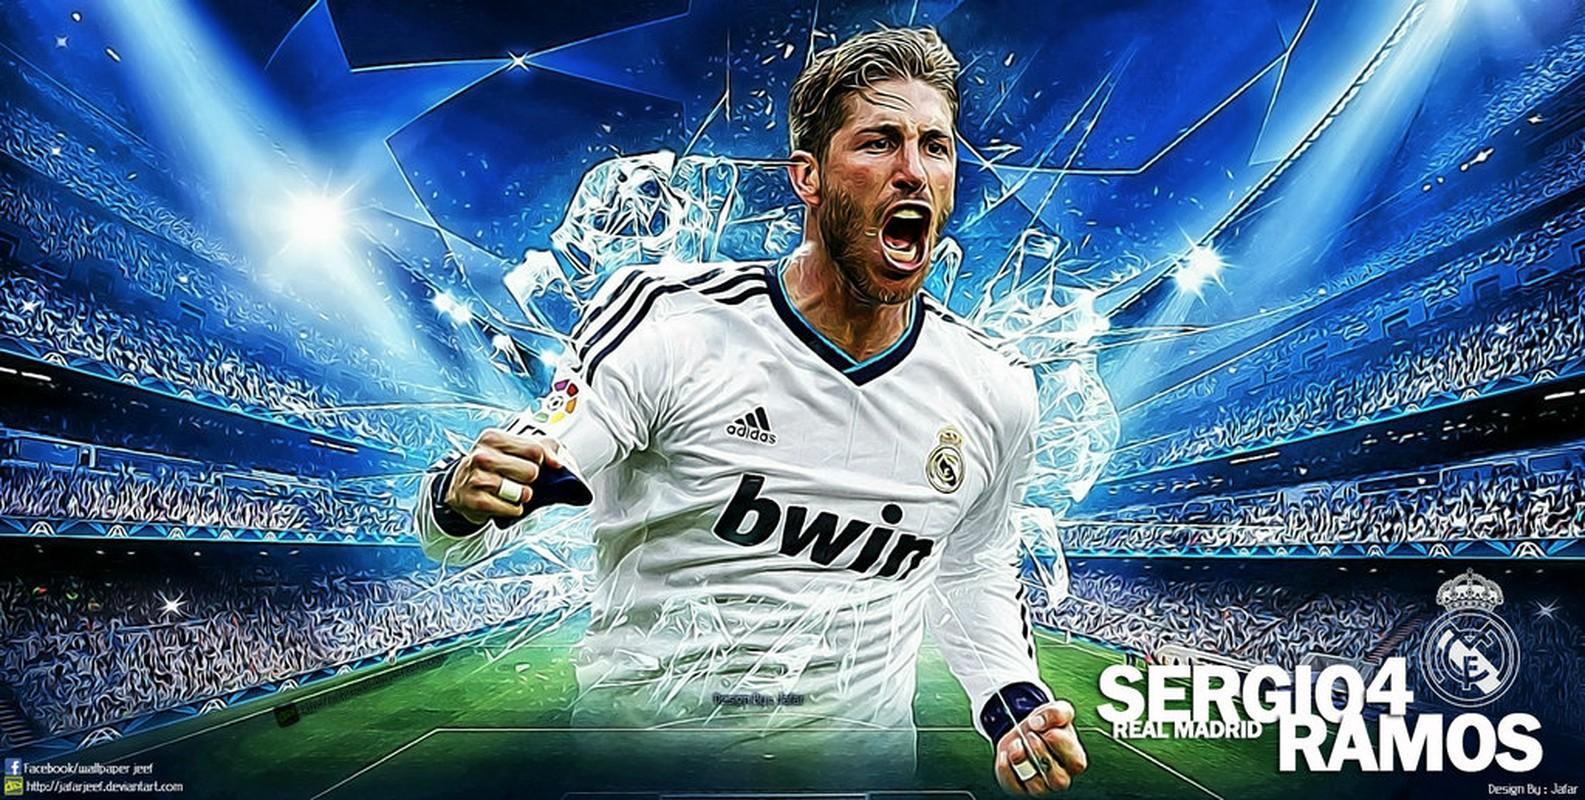 Doi hinh toan sao cua Real Madrid do Casillas binh chon-Hinh-3